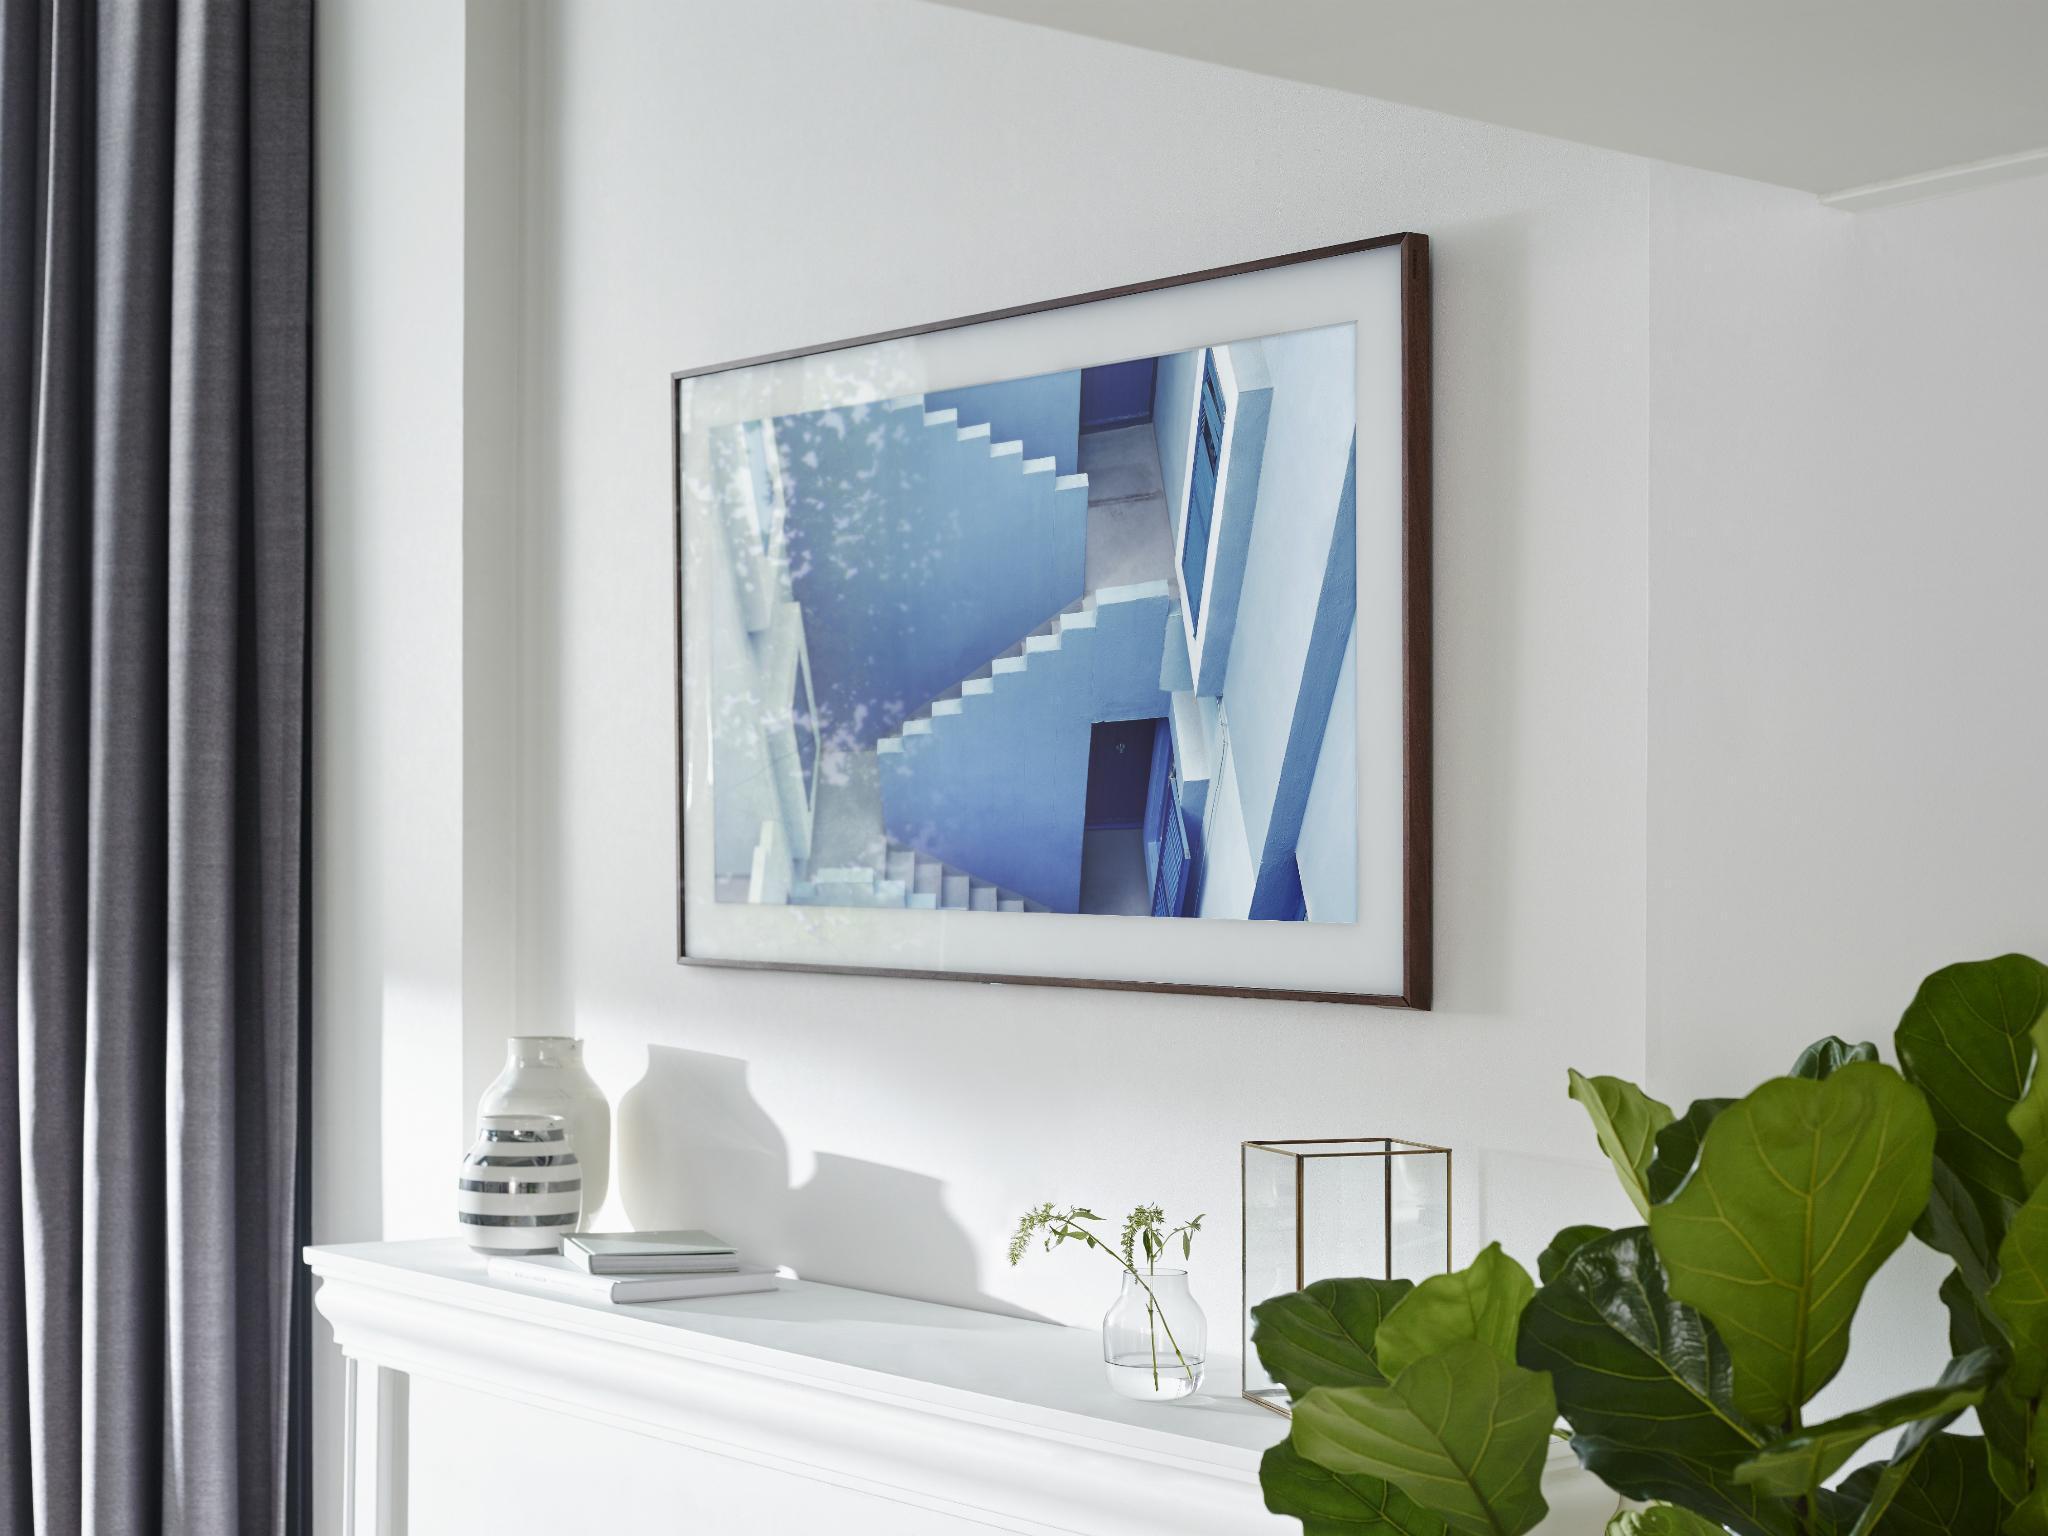 samsung-the-frame-tv-1.jpg